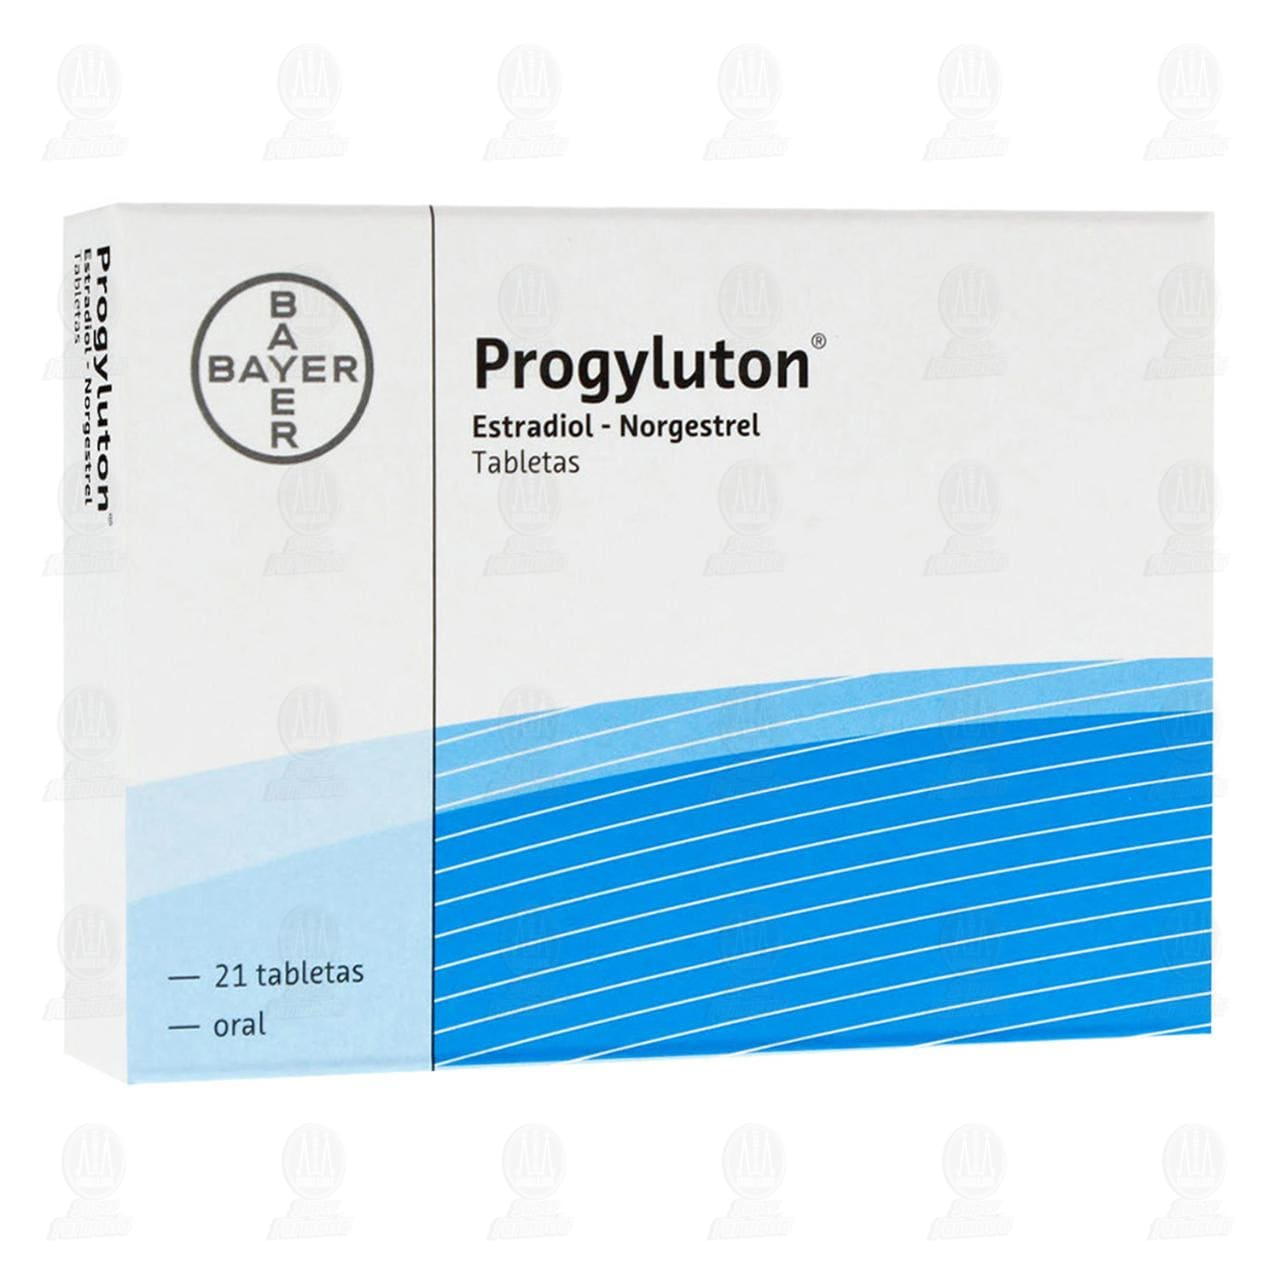 Comprar Progyluton 21 Tabletas en Farmacias Guadalajara